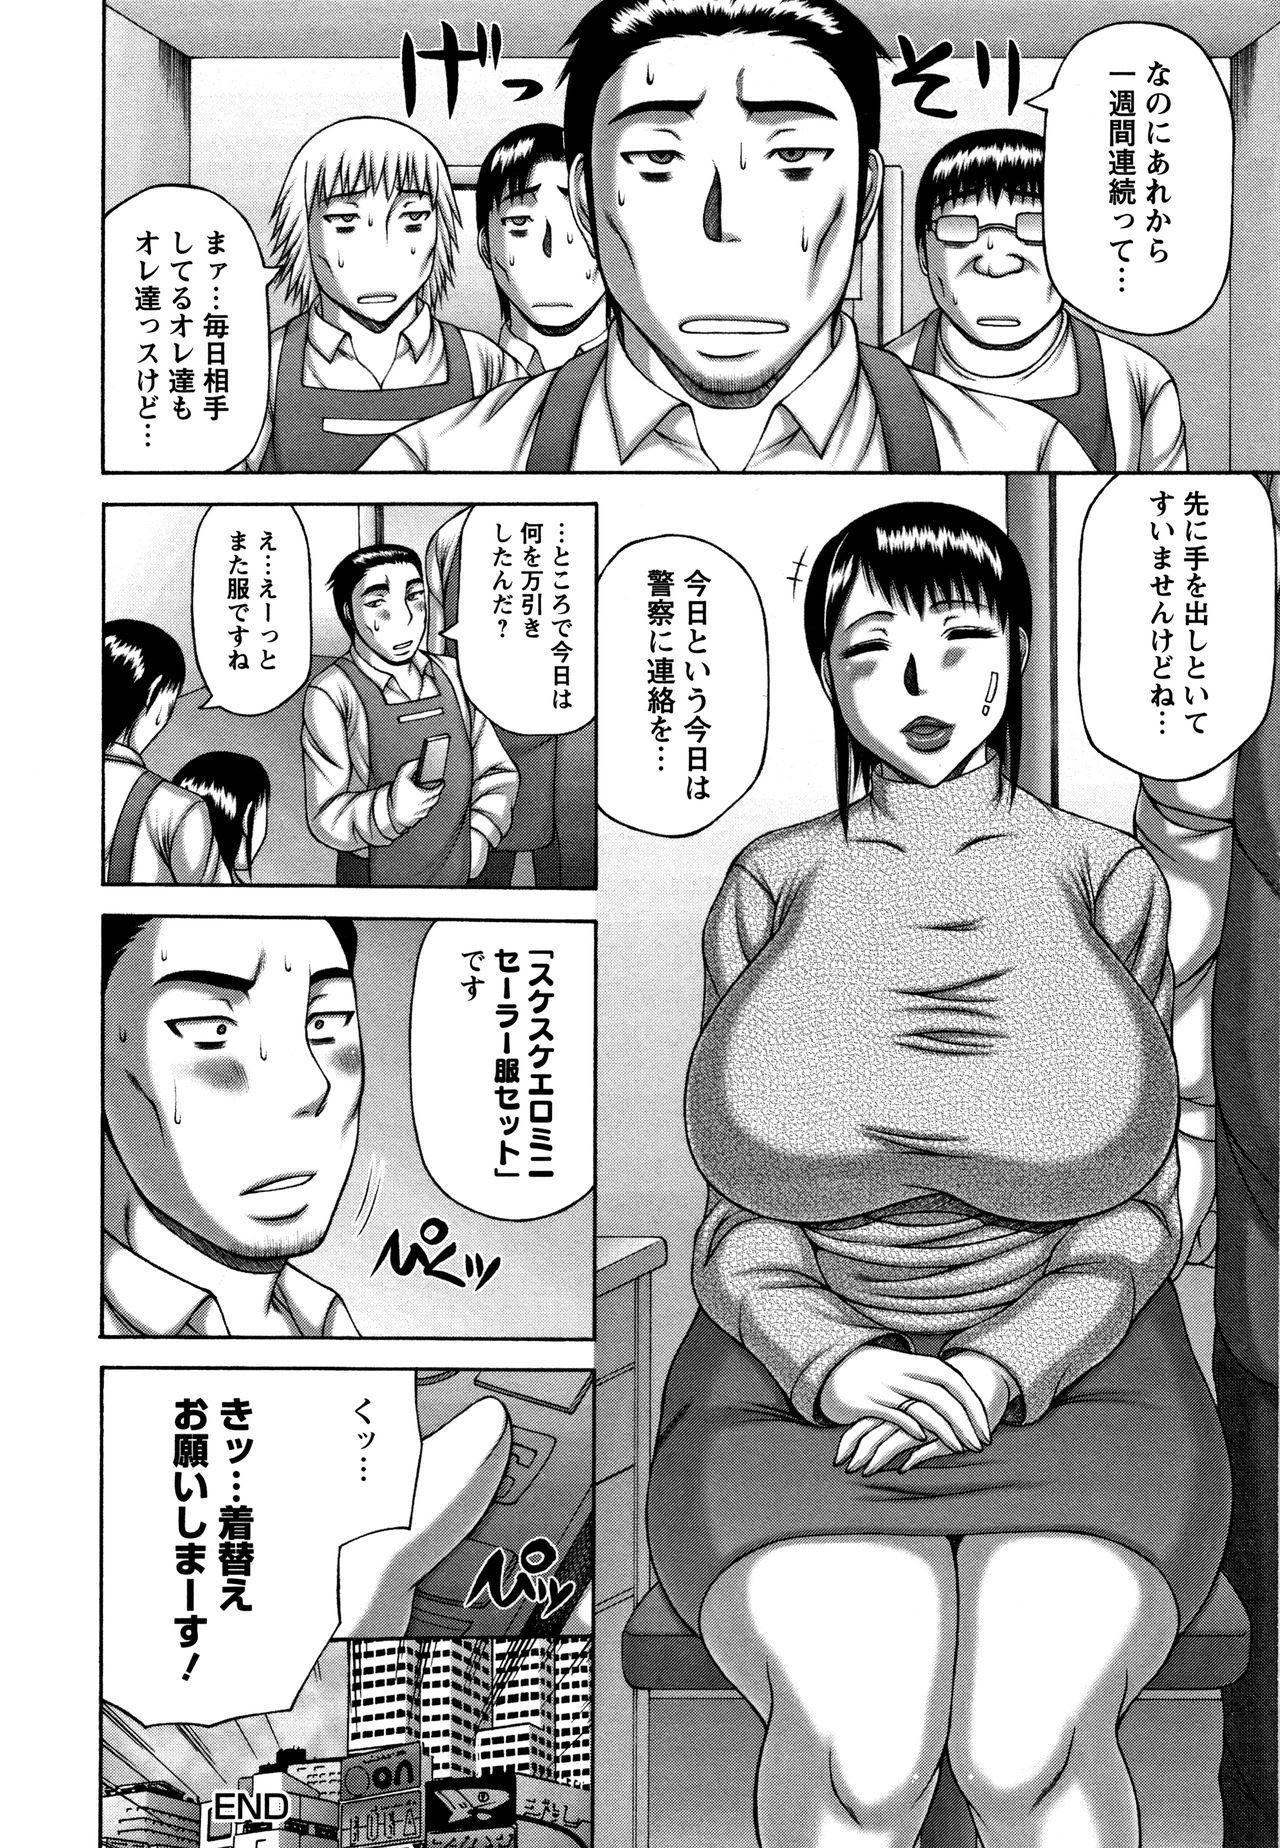 Tsuma no Netorare Kinenbi - My Wife NTR Memorial Day 44